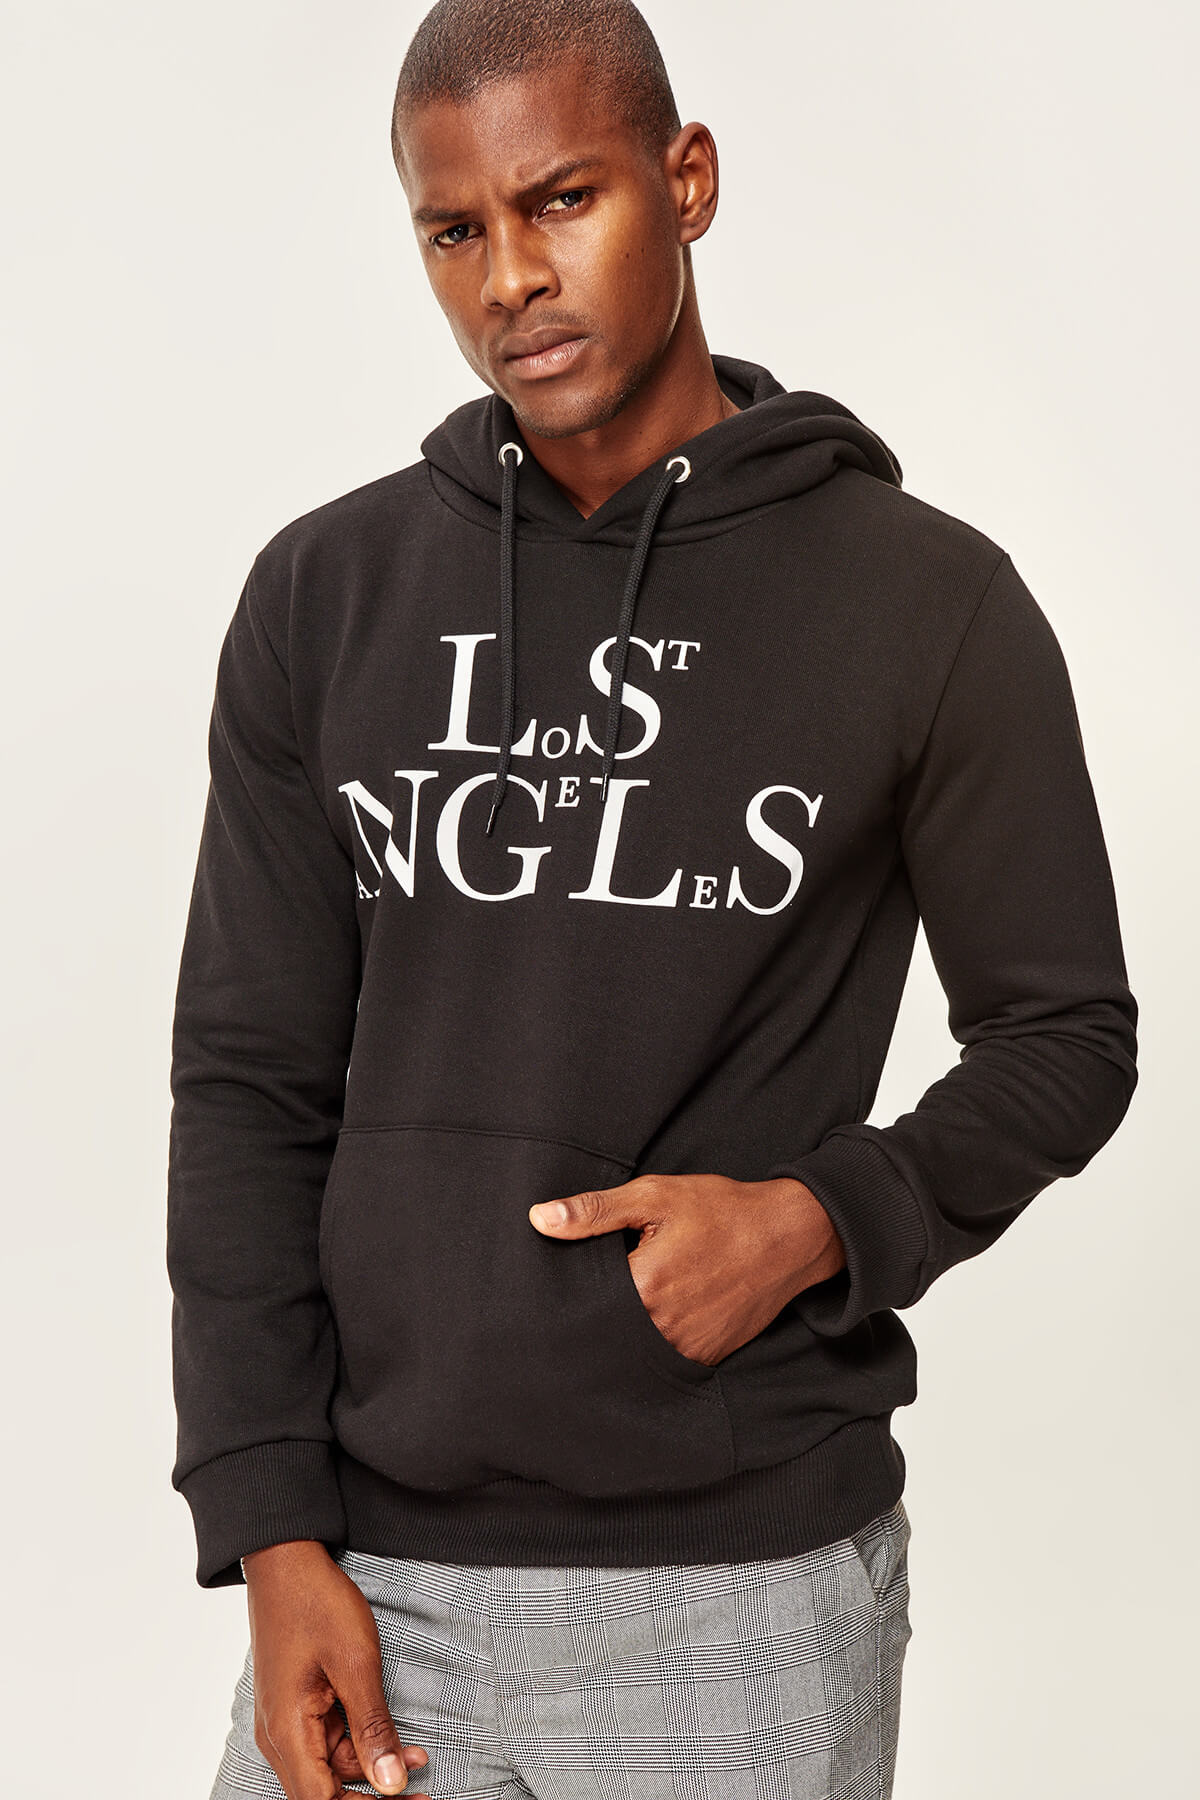 Trendyol Black Men's Sweatshirts-Hooded Kangaroo Pocket Chart-Printed